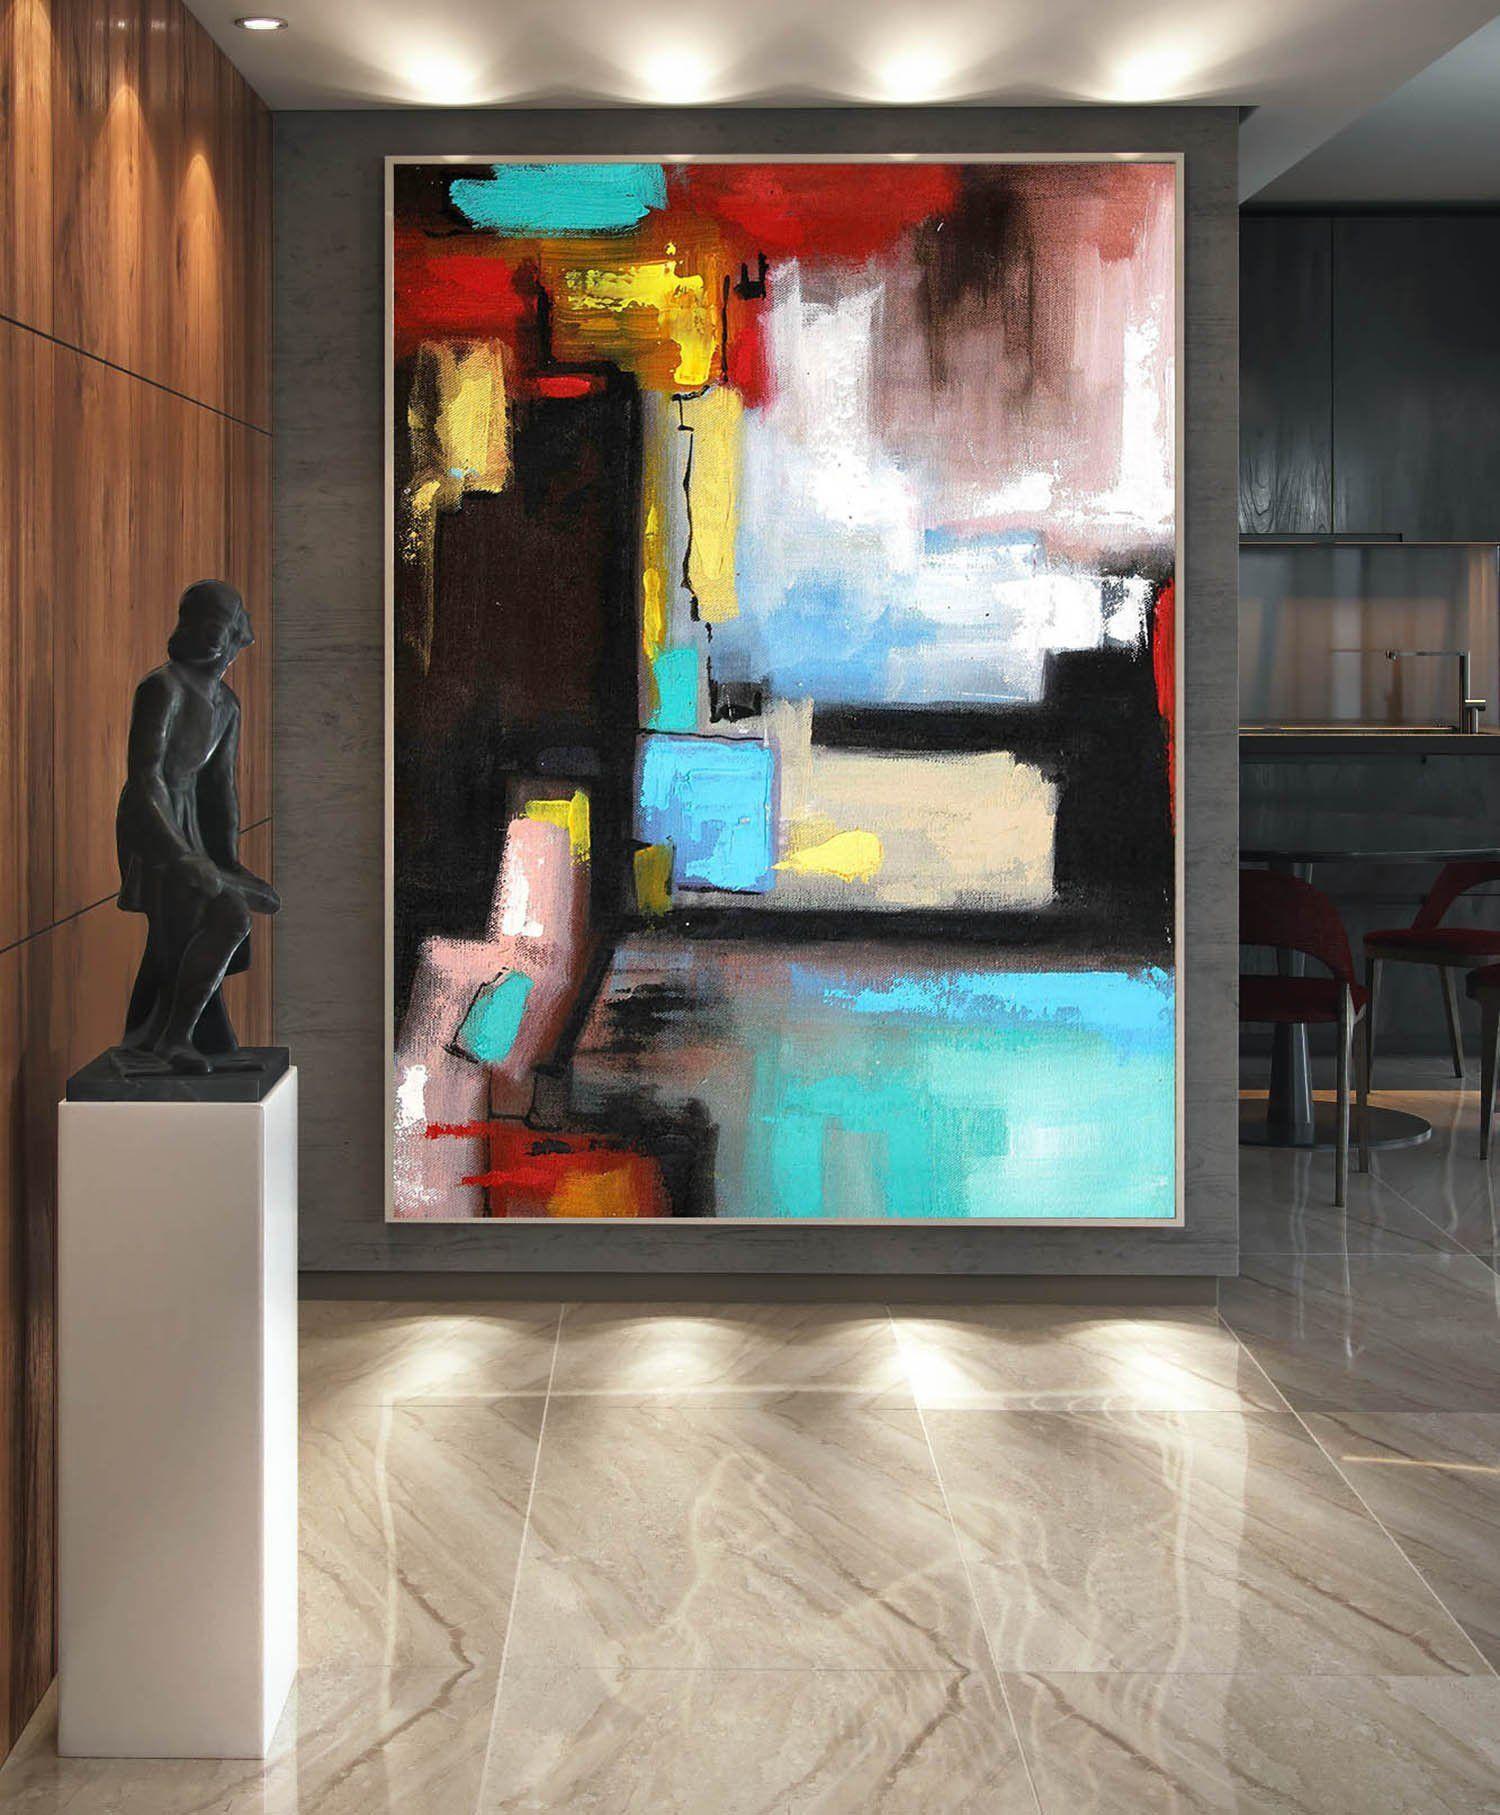 Large Painting On Canvas Abstract Painting Acrylic Painting On Canvas Art Oil Painting Oversize Ca Pinturas De Arte Abstrata Parede De Entrada Arte Em Pintura